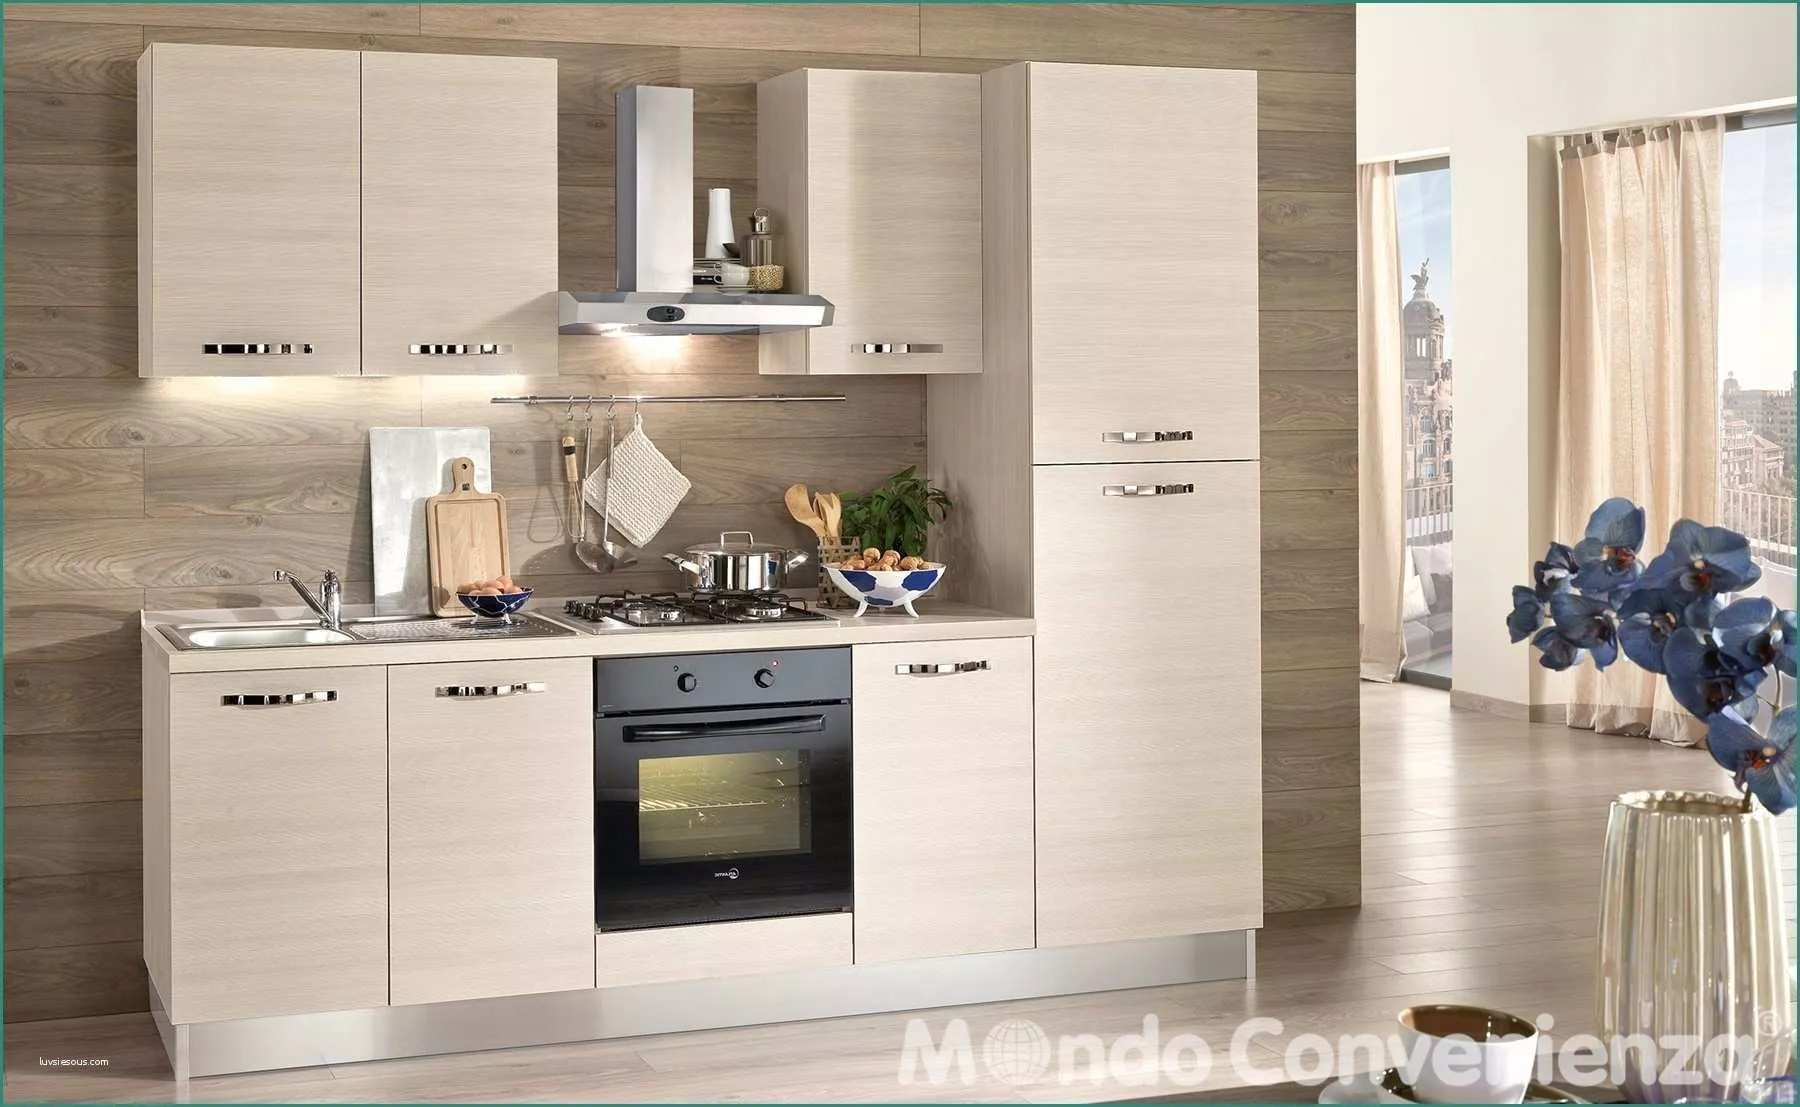 Cucina Stella 300 Mondo Convenienza